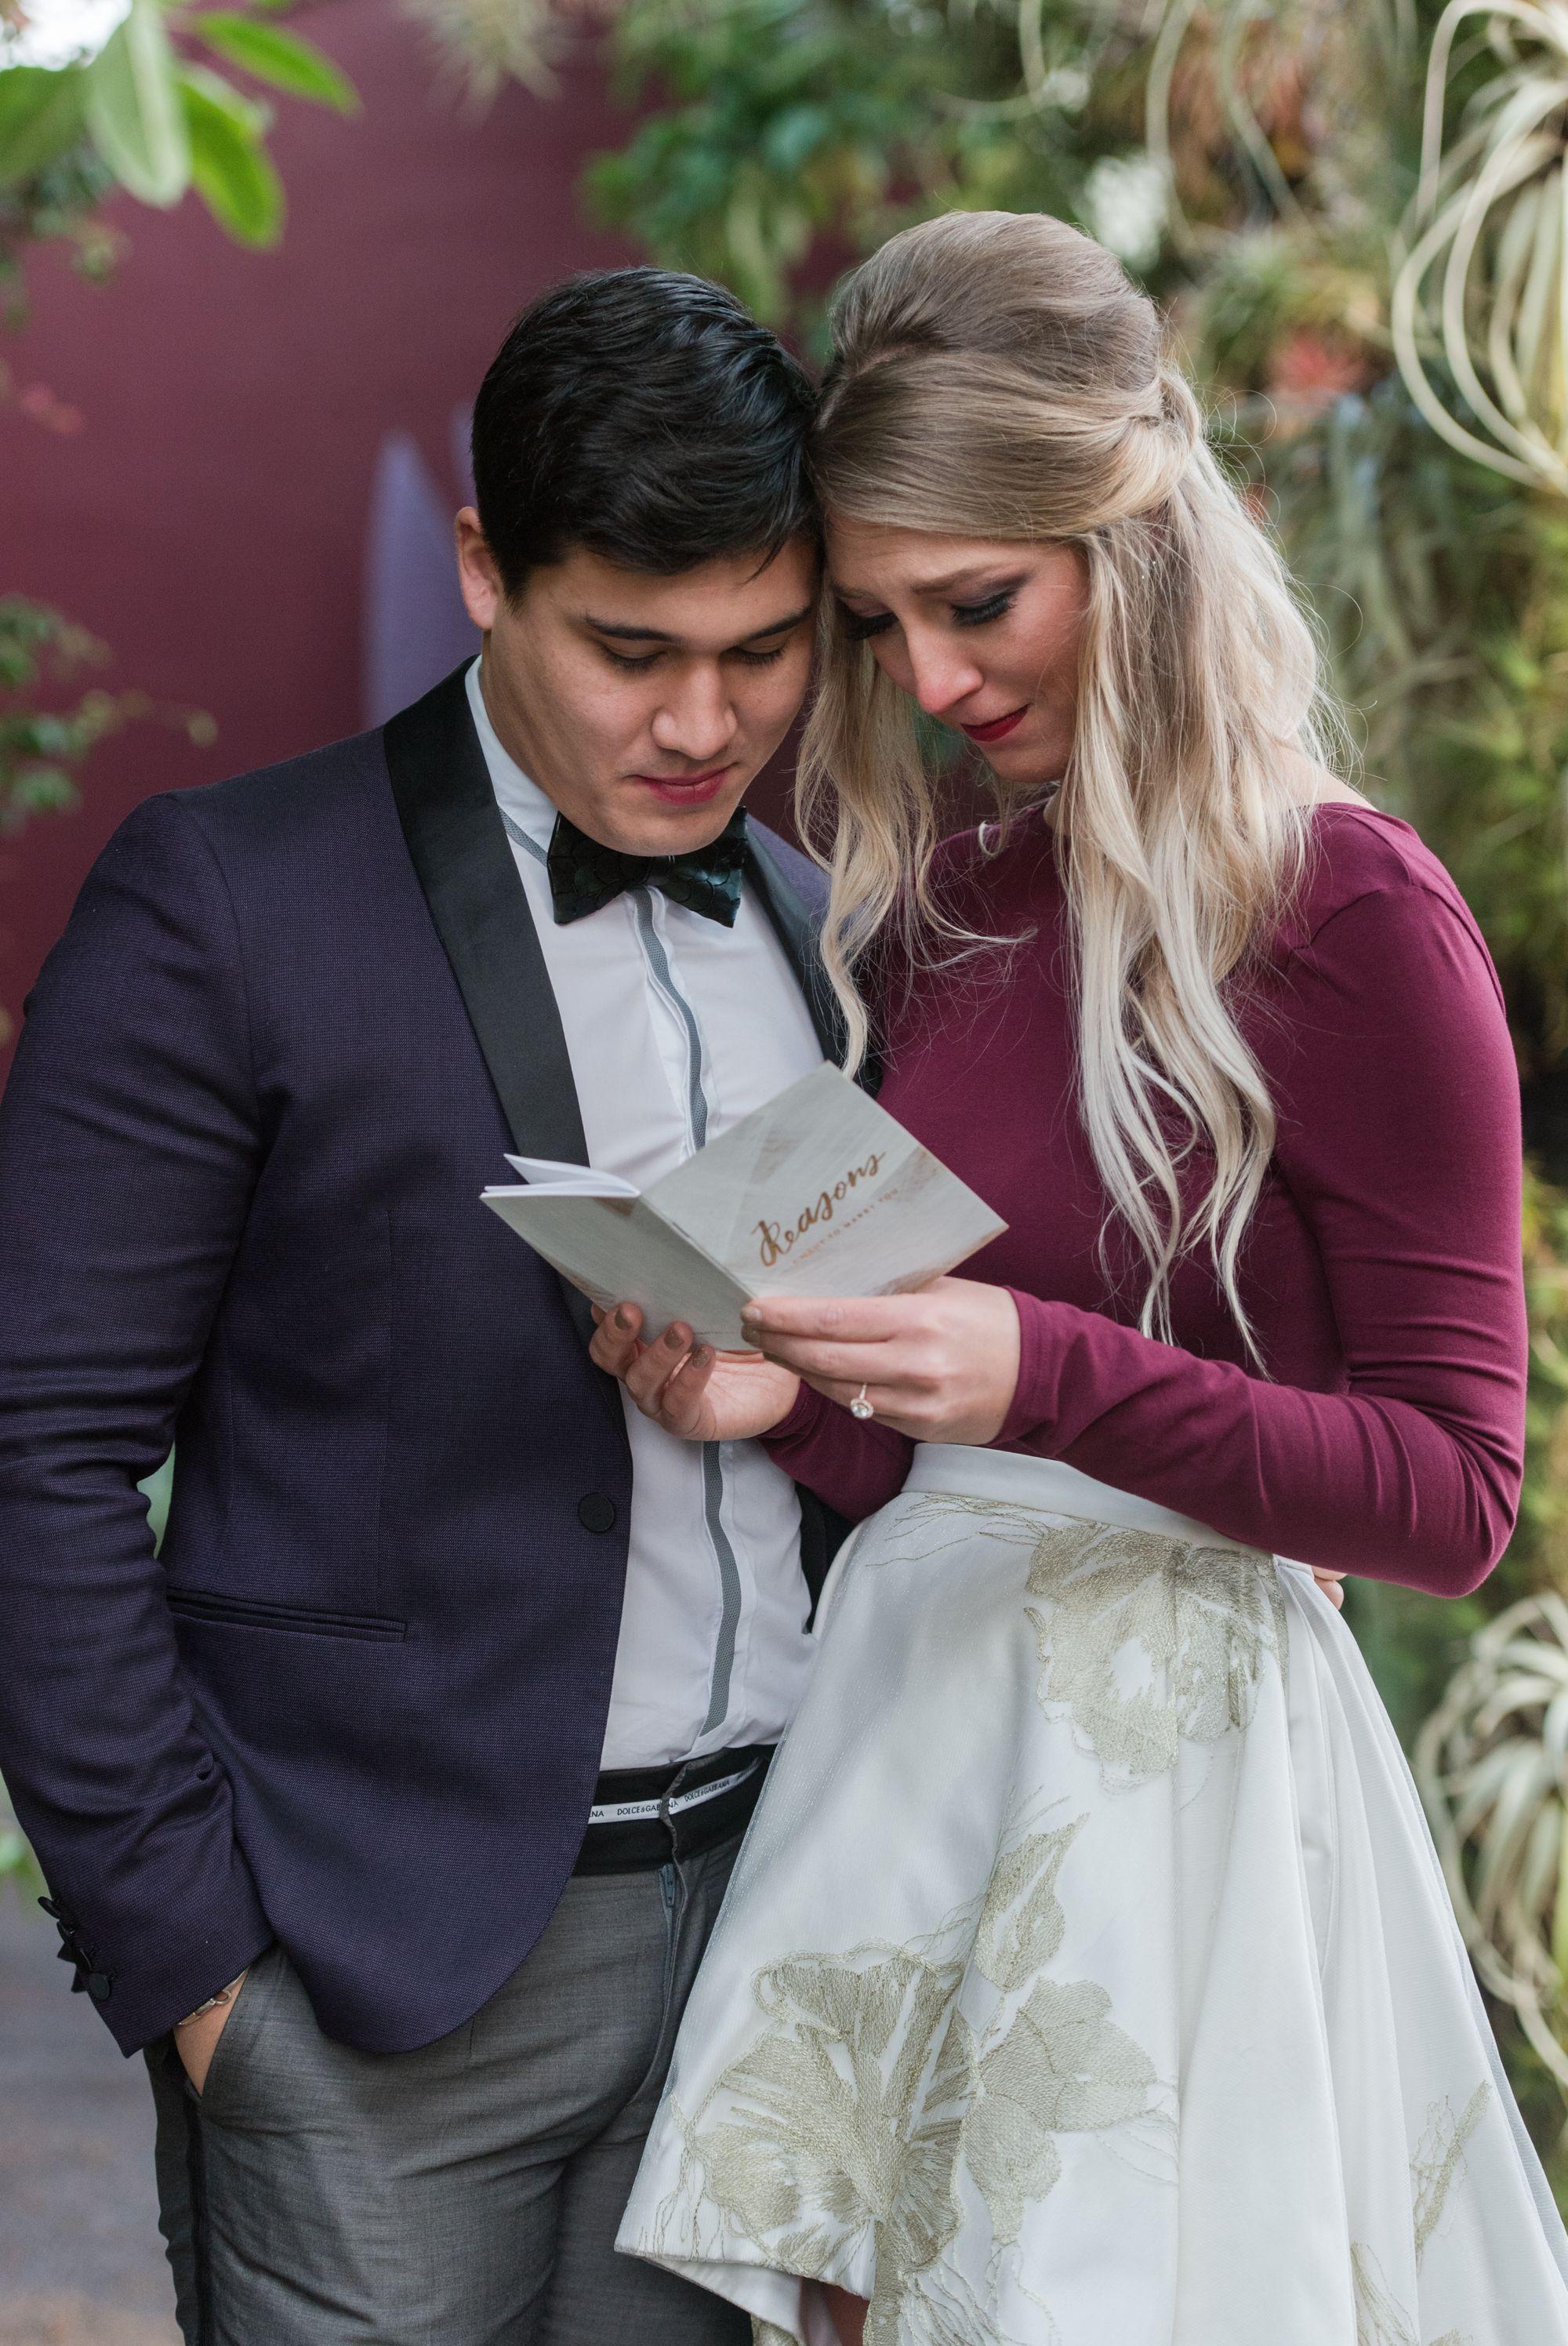 romantic wedding proposal